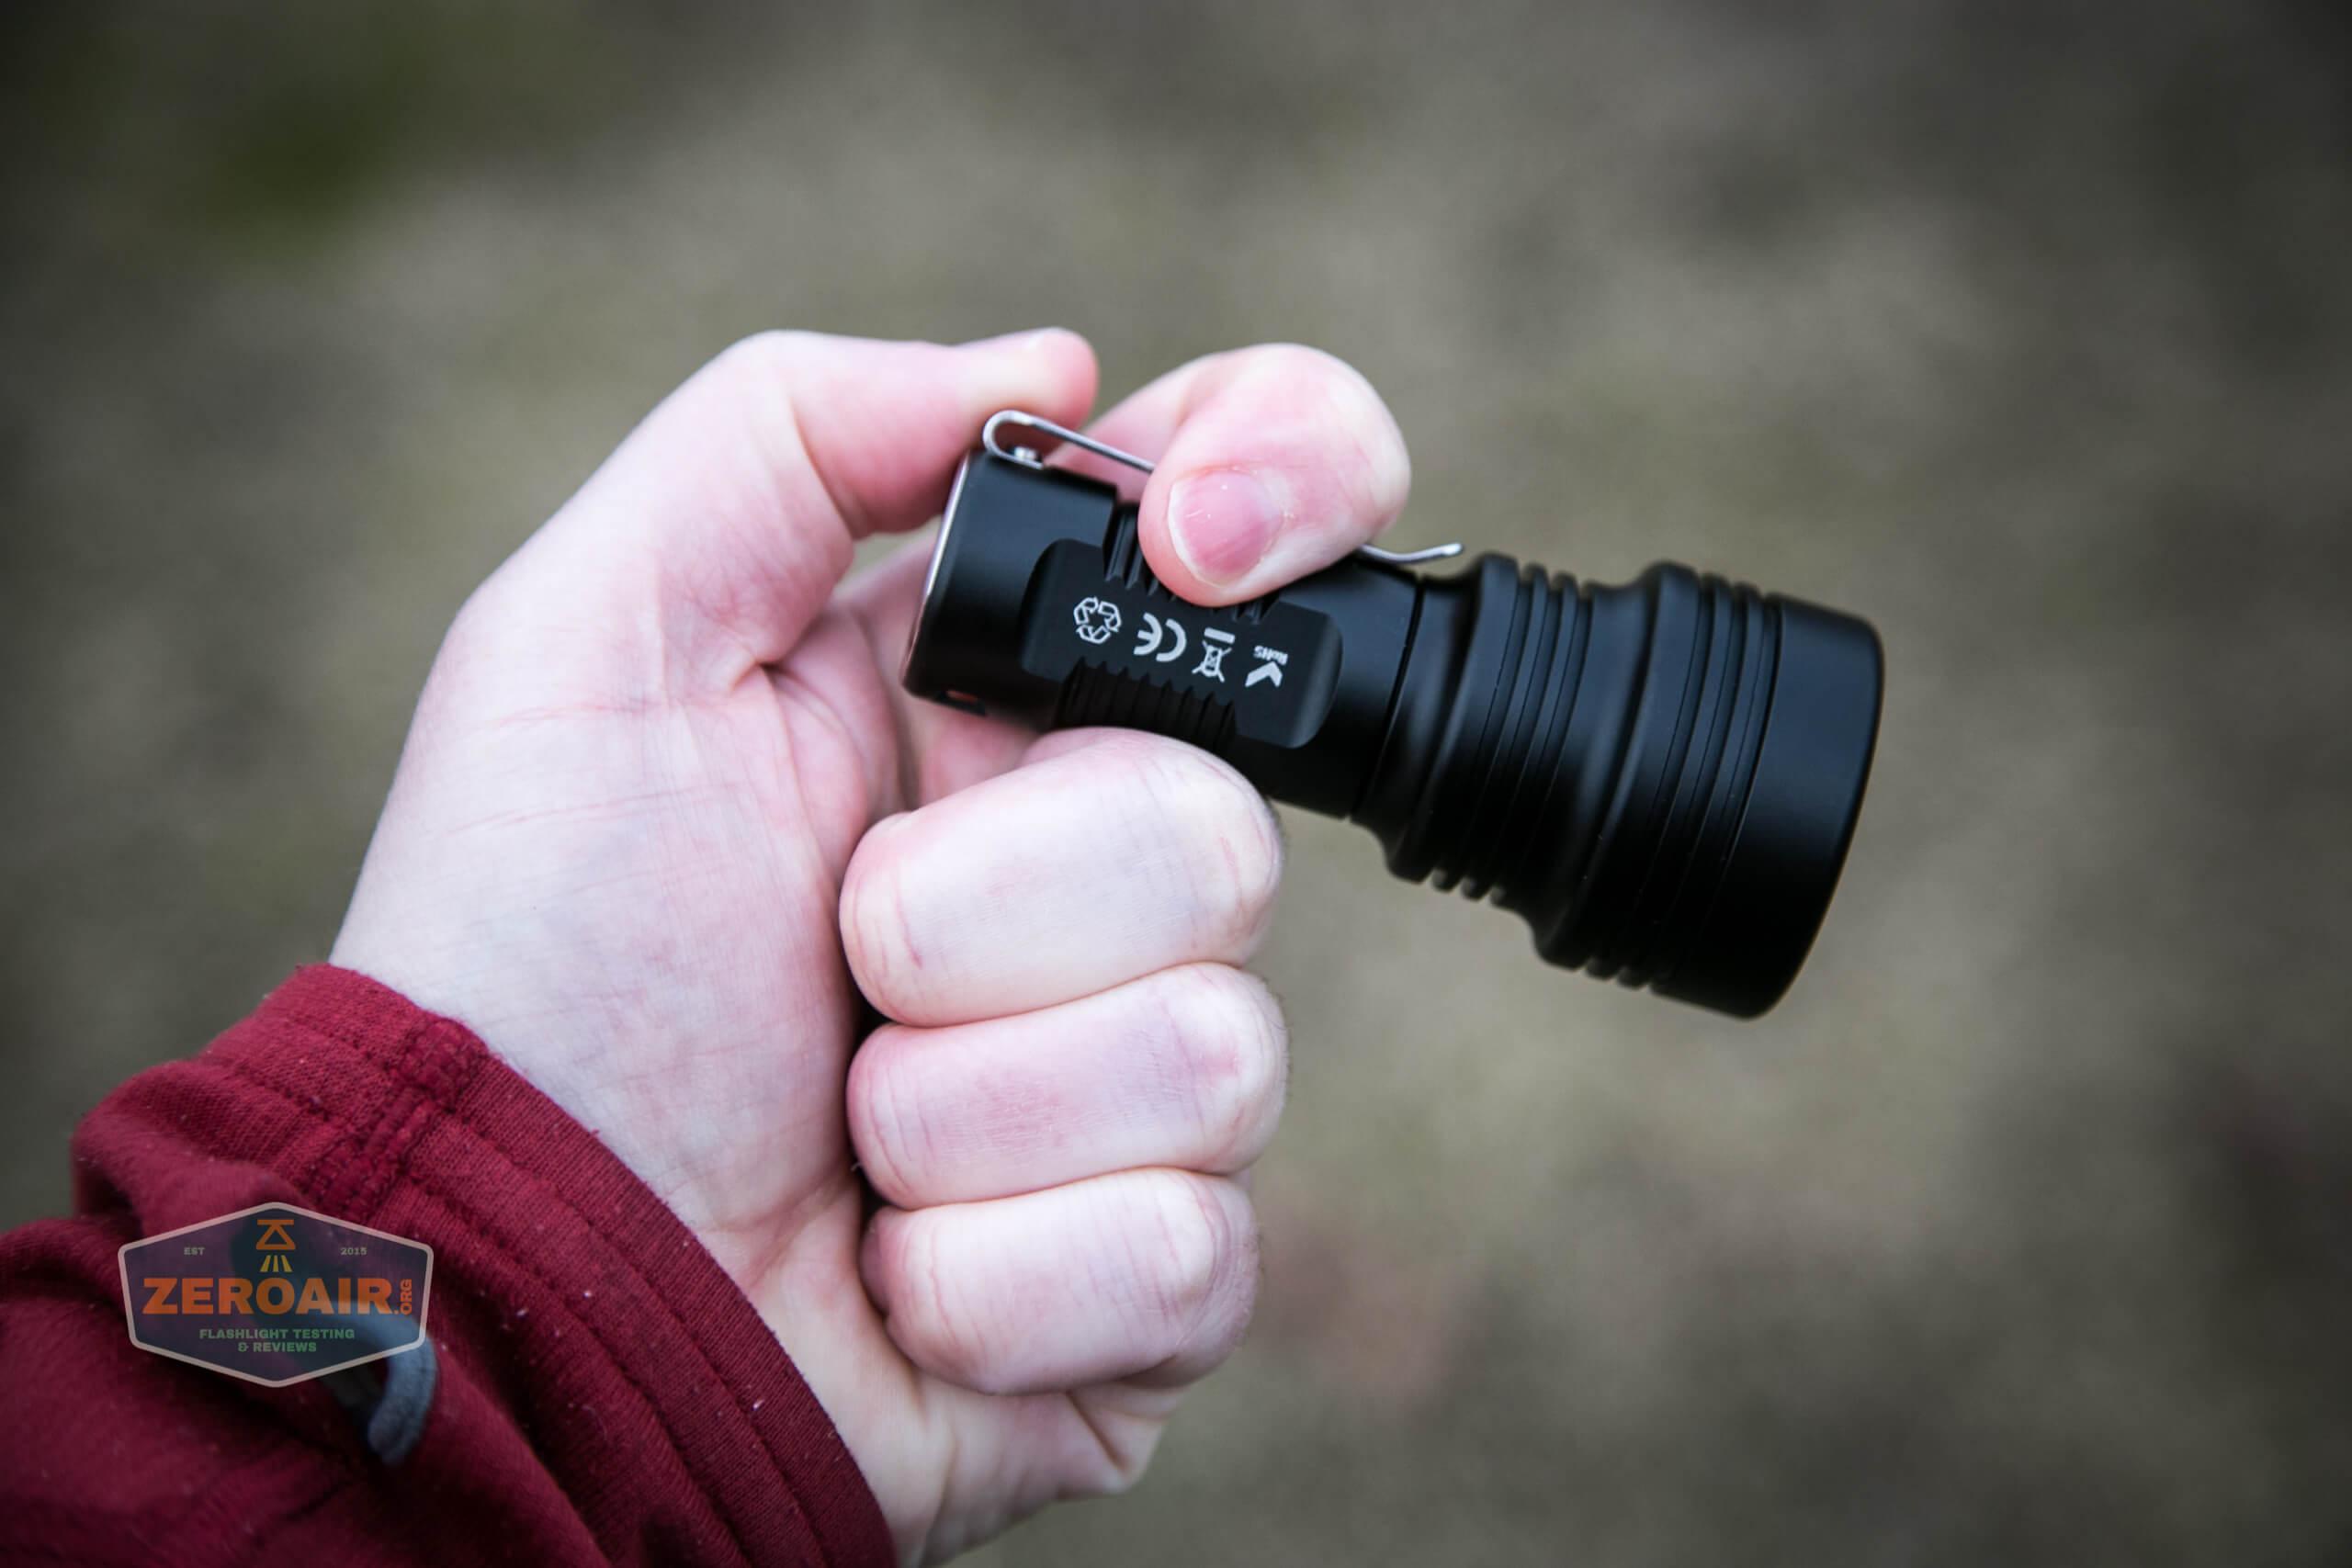 Manker MC13 thrower flashlight 18350 in hand